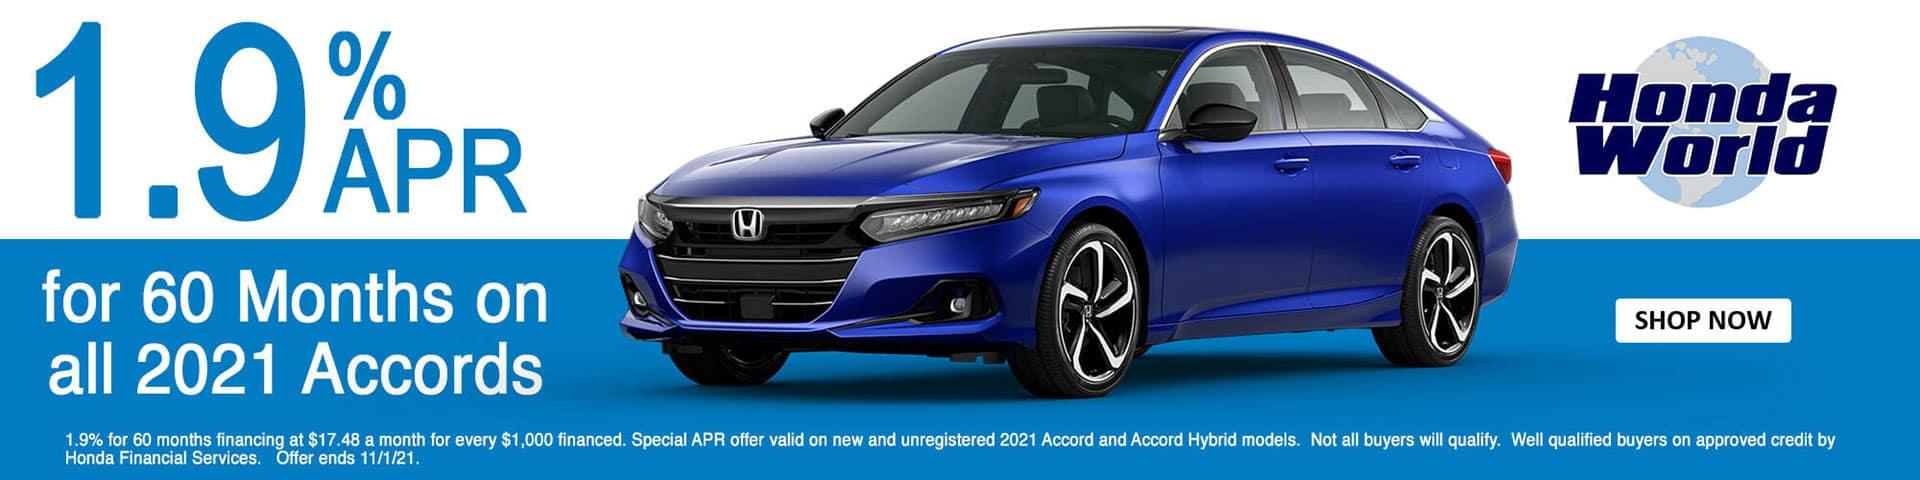 2021 Honda Accord APR Offer